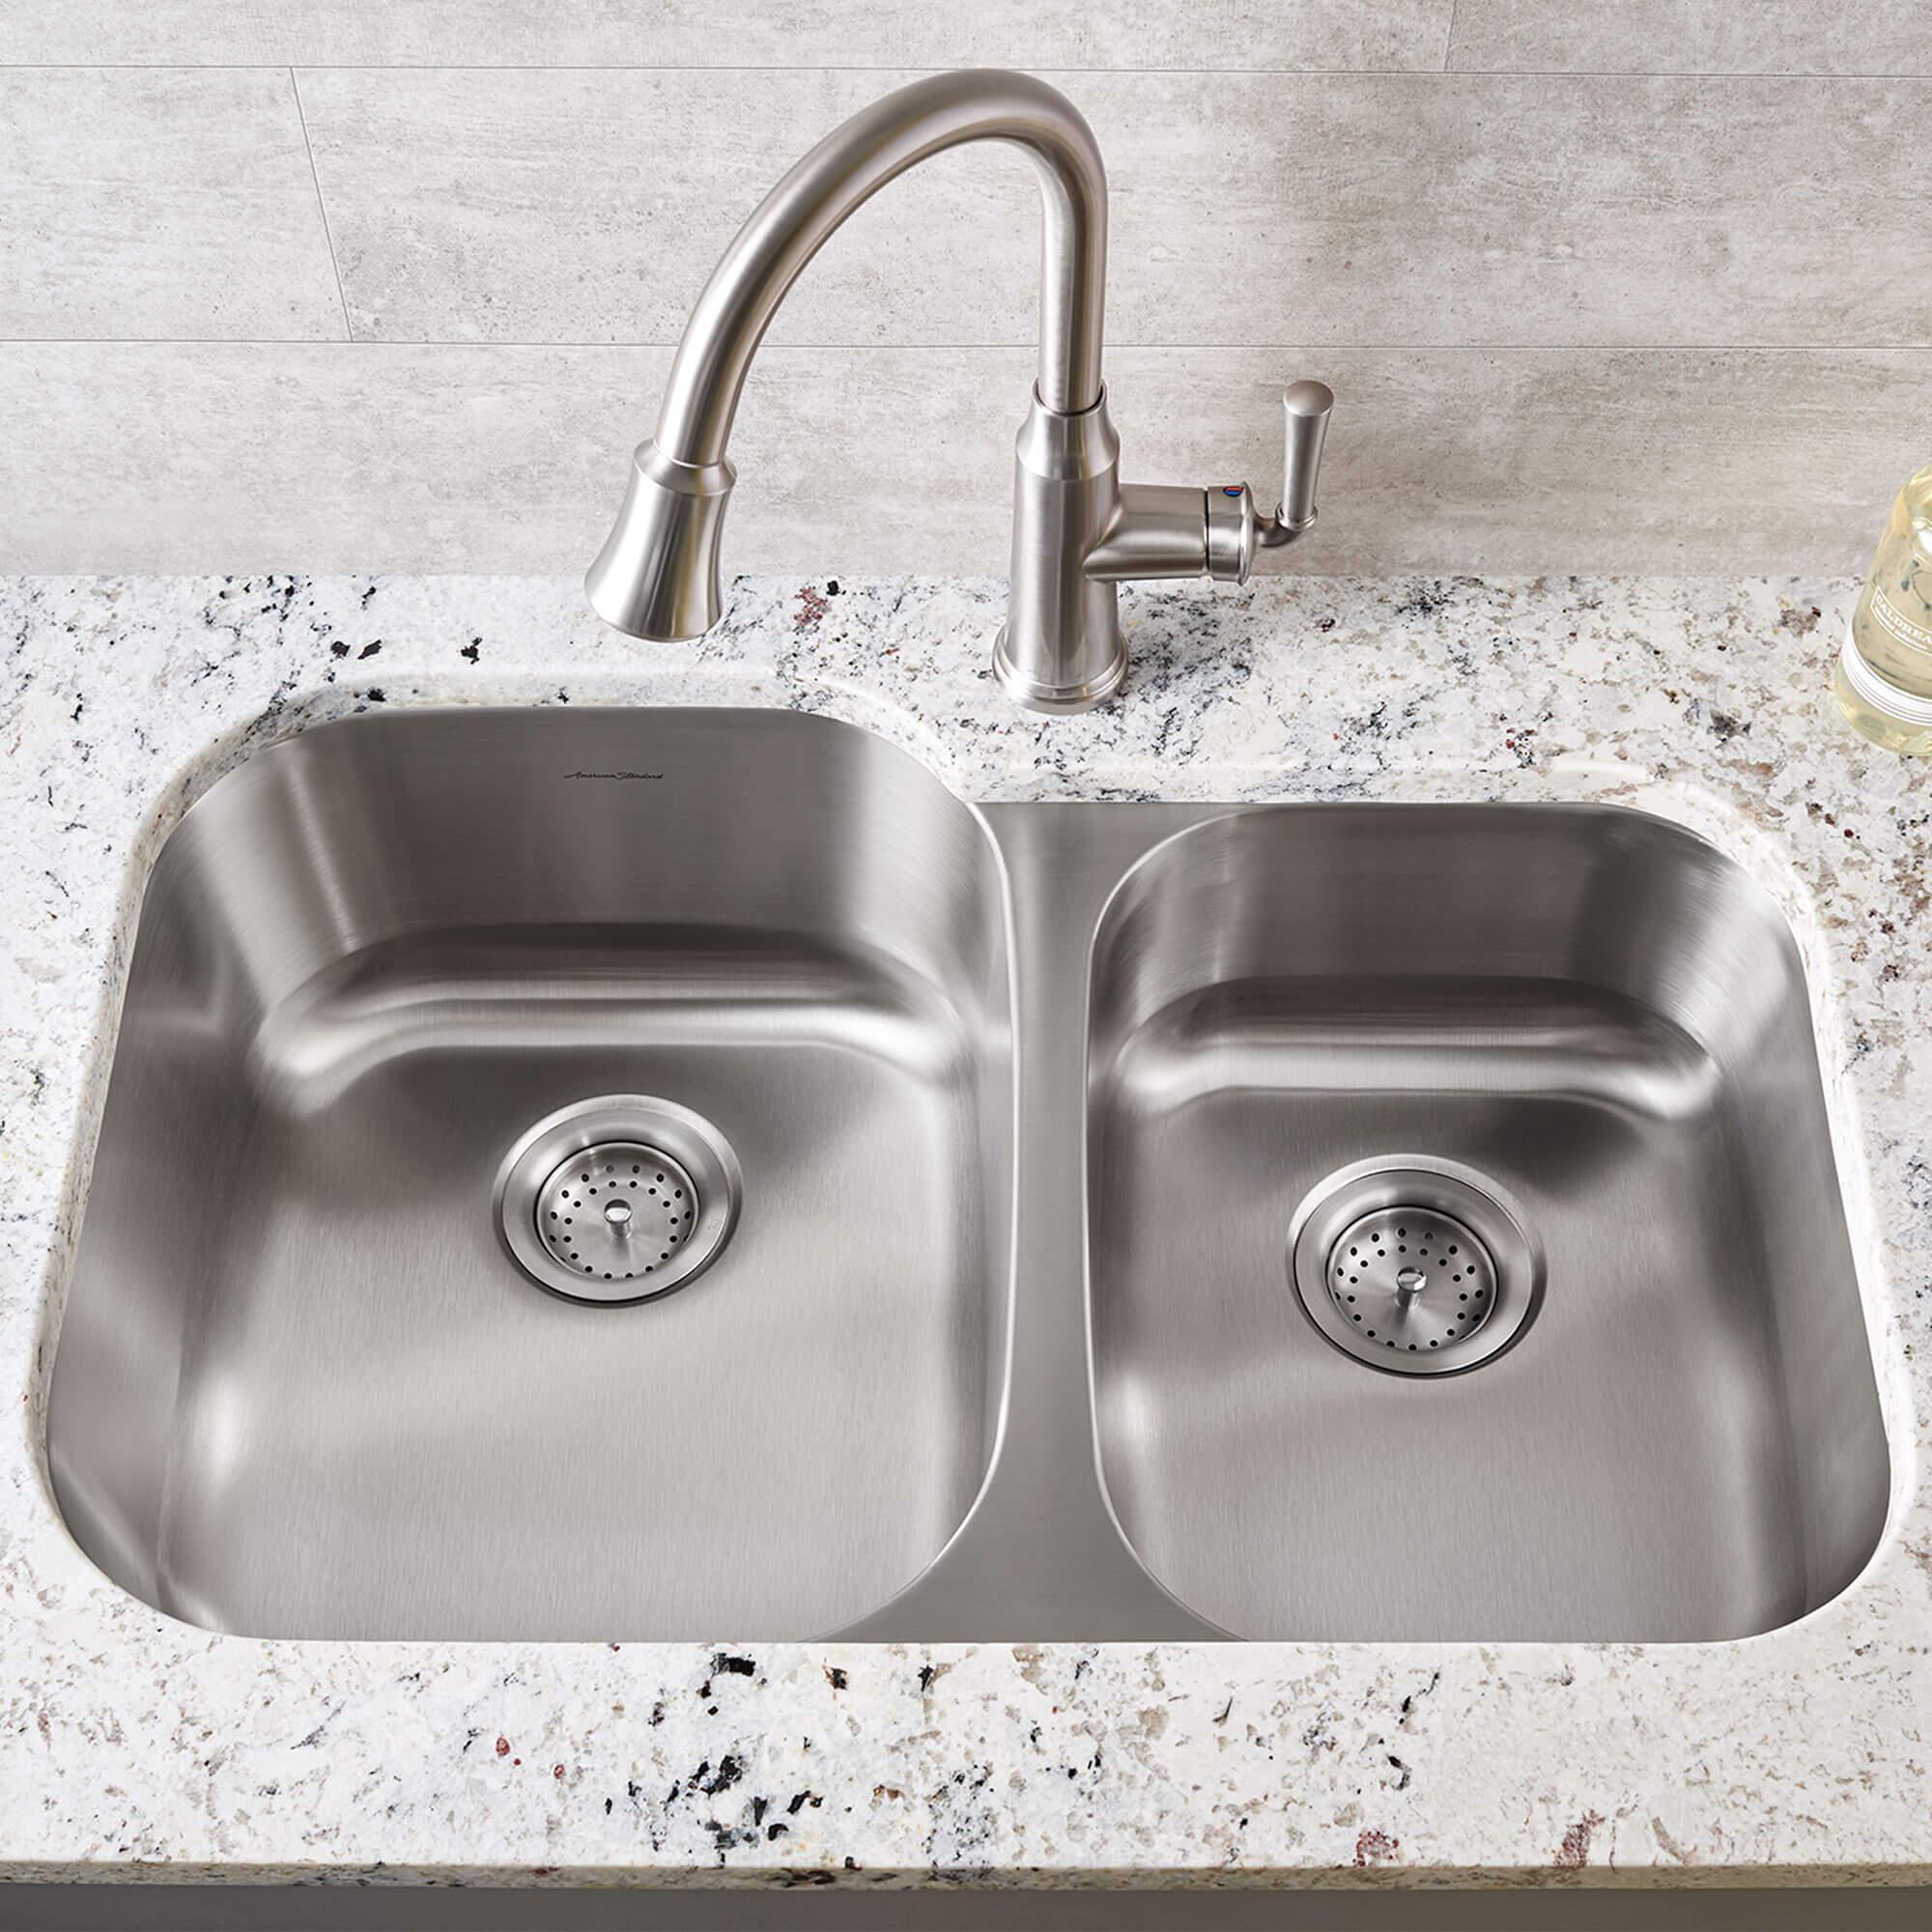 portsmouth kitchen faucet sink